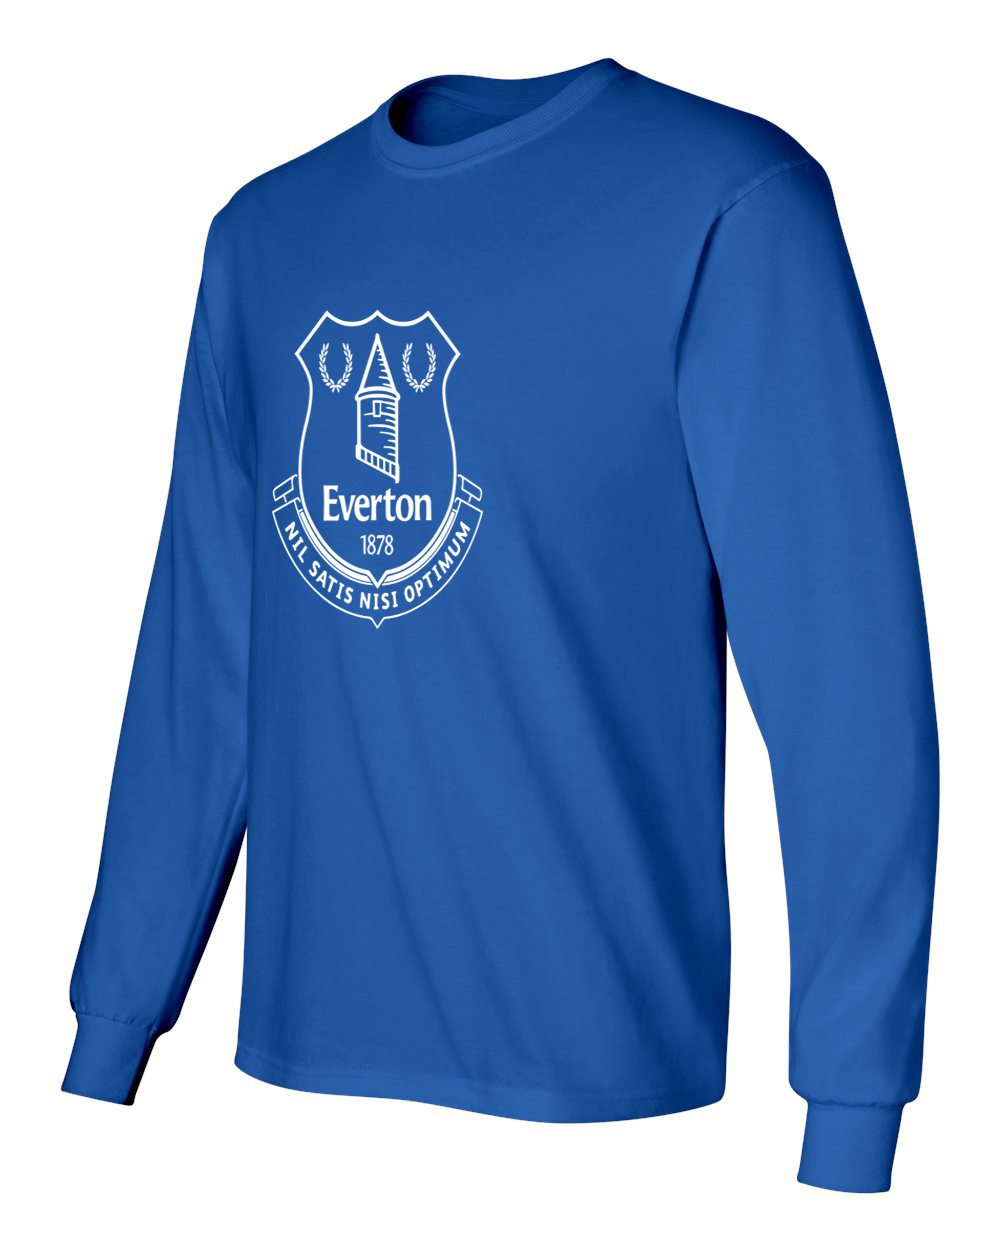 reputable site 960e9 ccc15 Amazon.com : Everton Wayne Rooney #10 Jersey Shirt Soccer ...